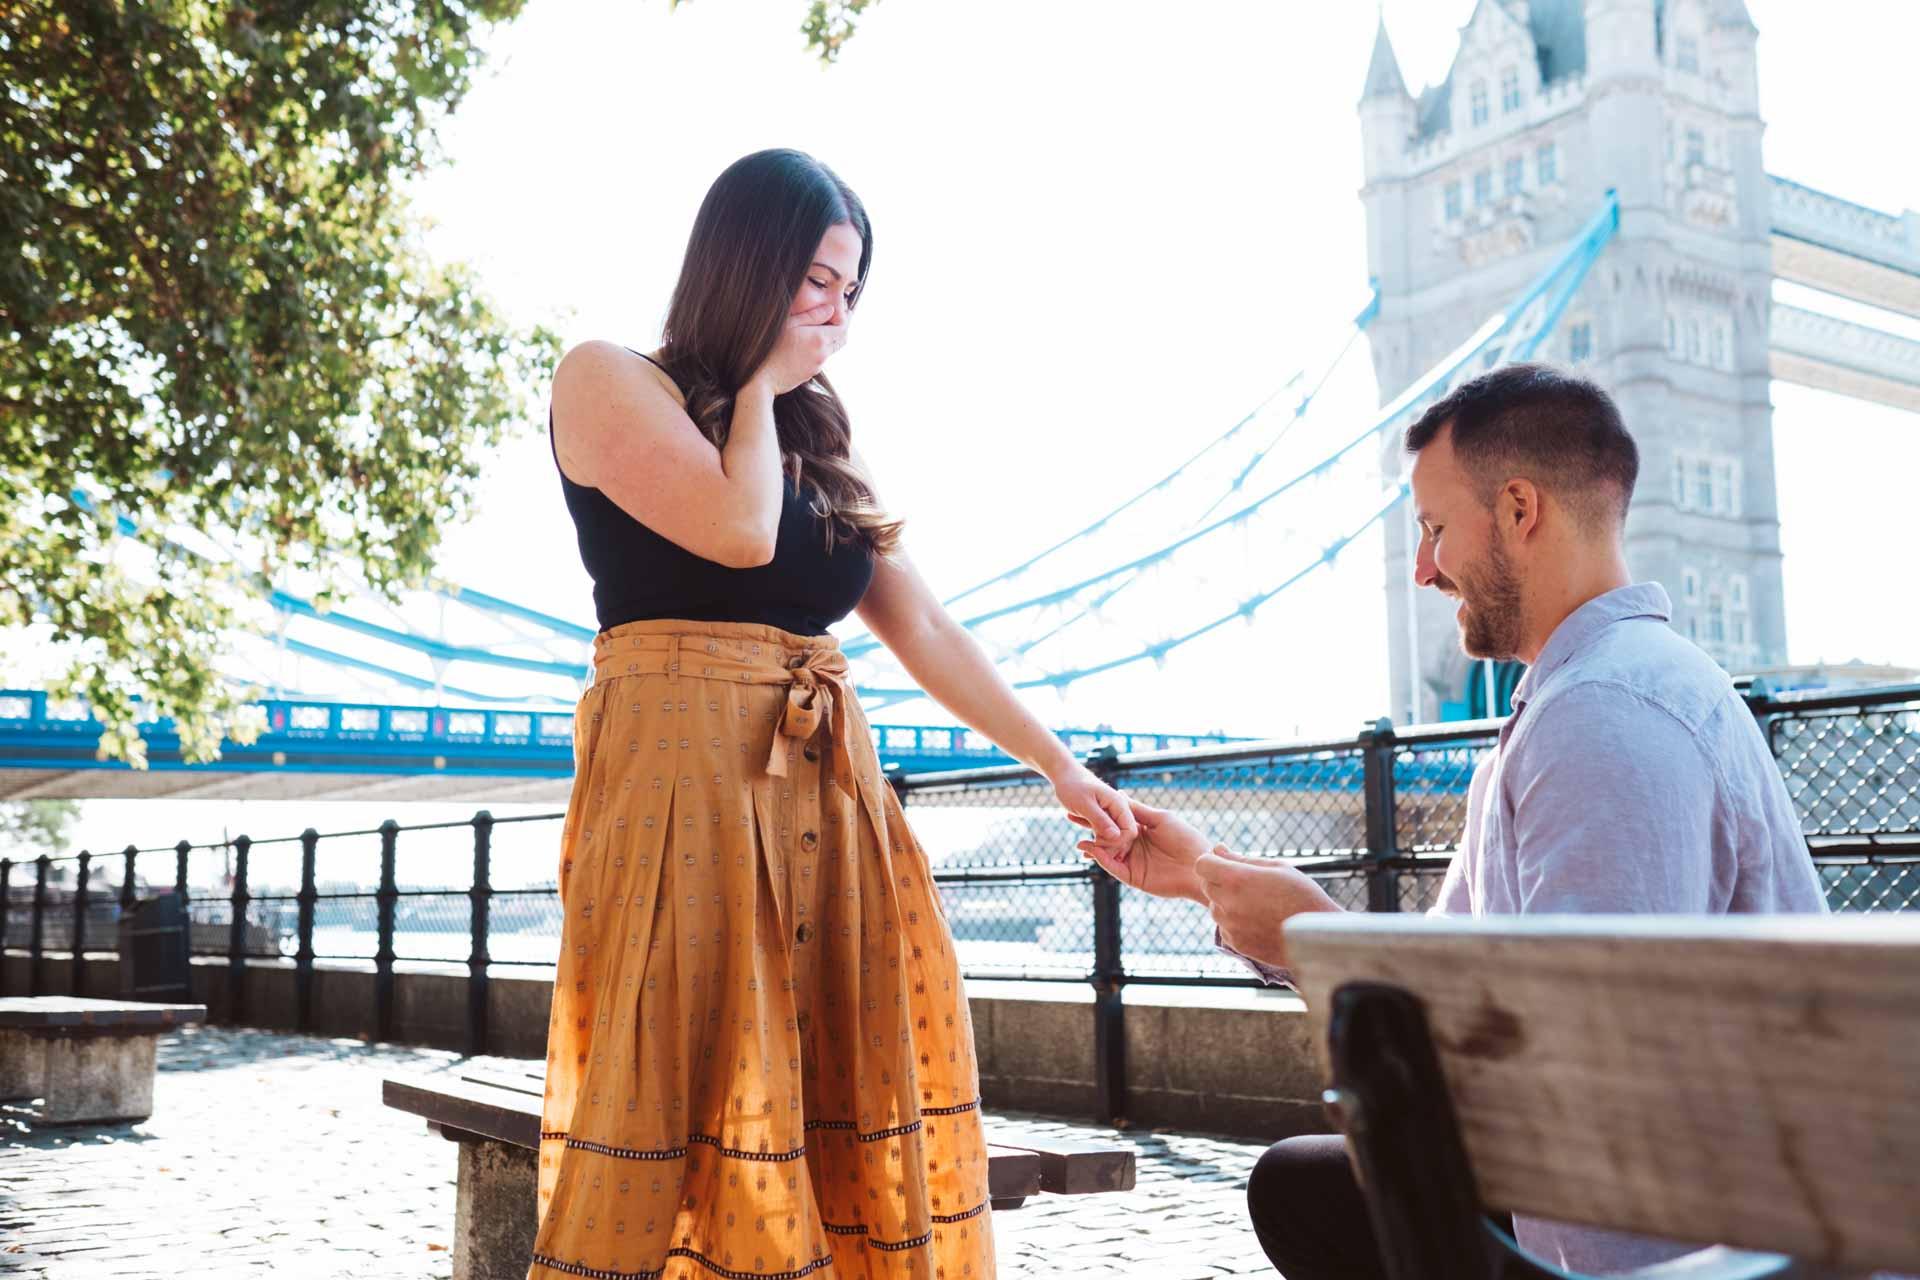 proposal photographer london by Tower Bridge